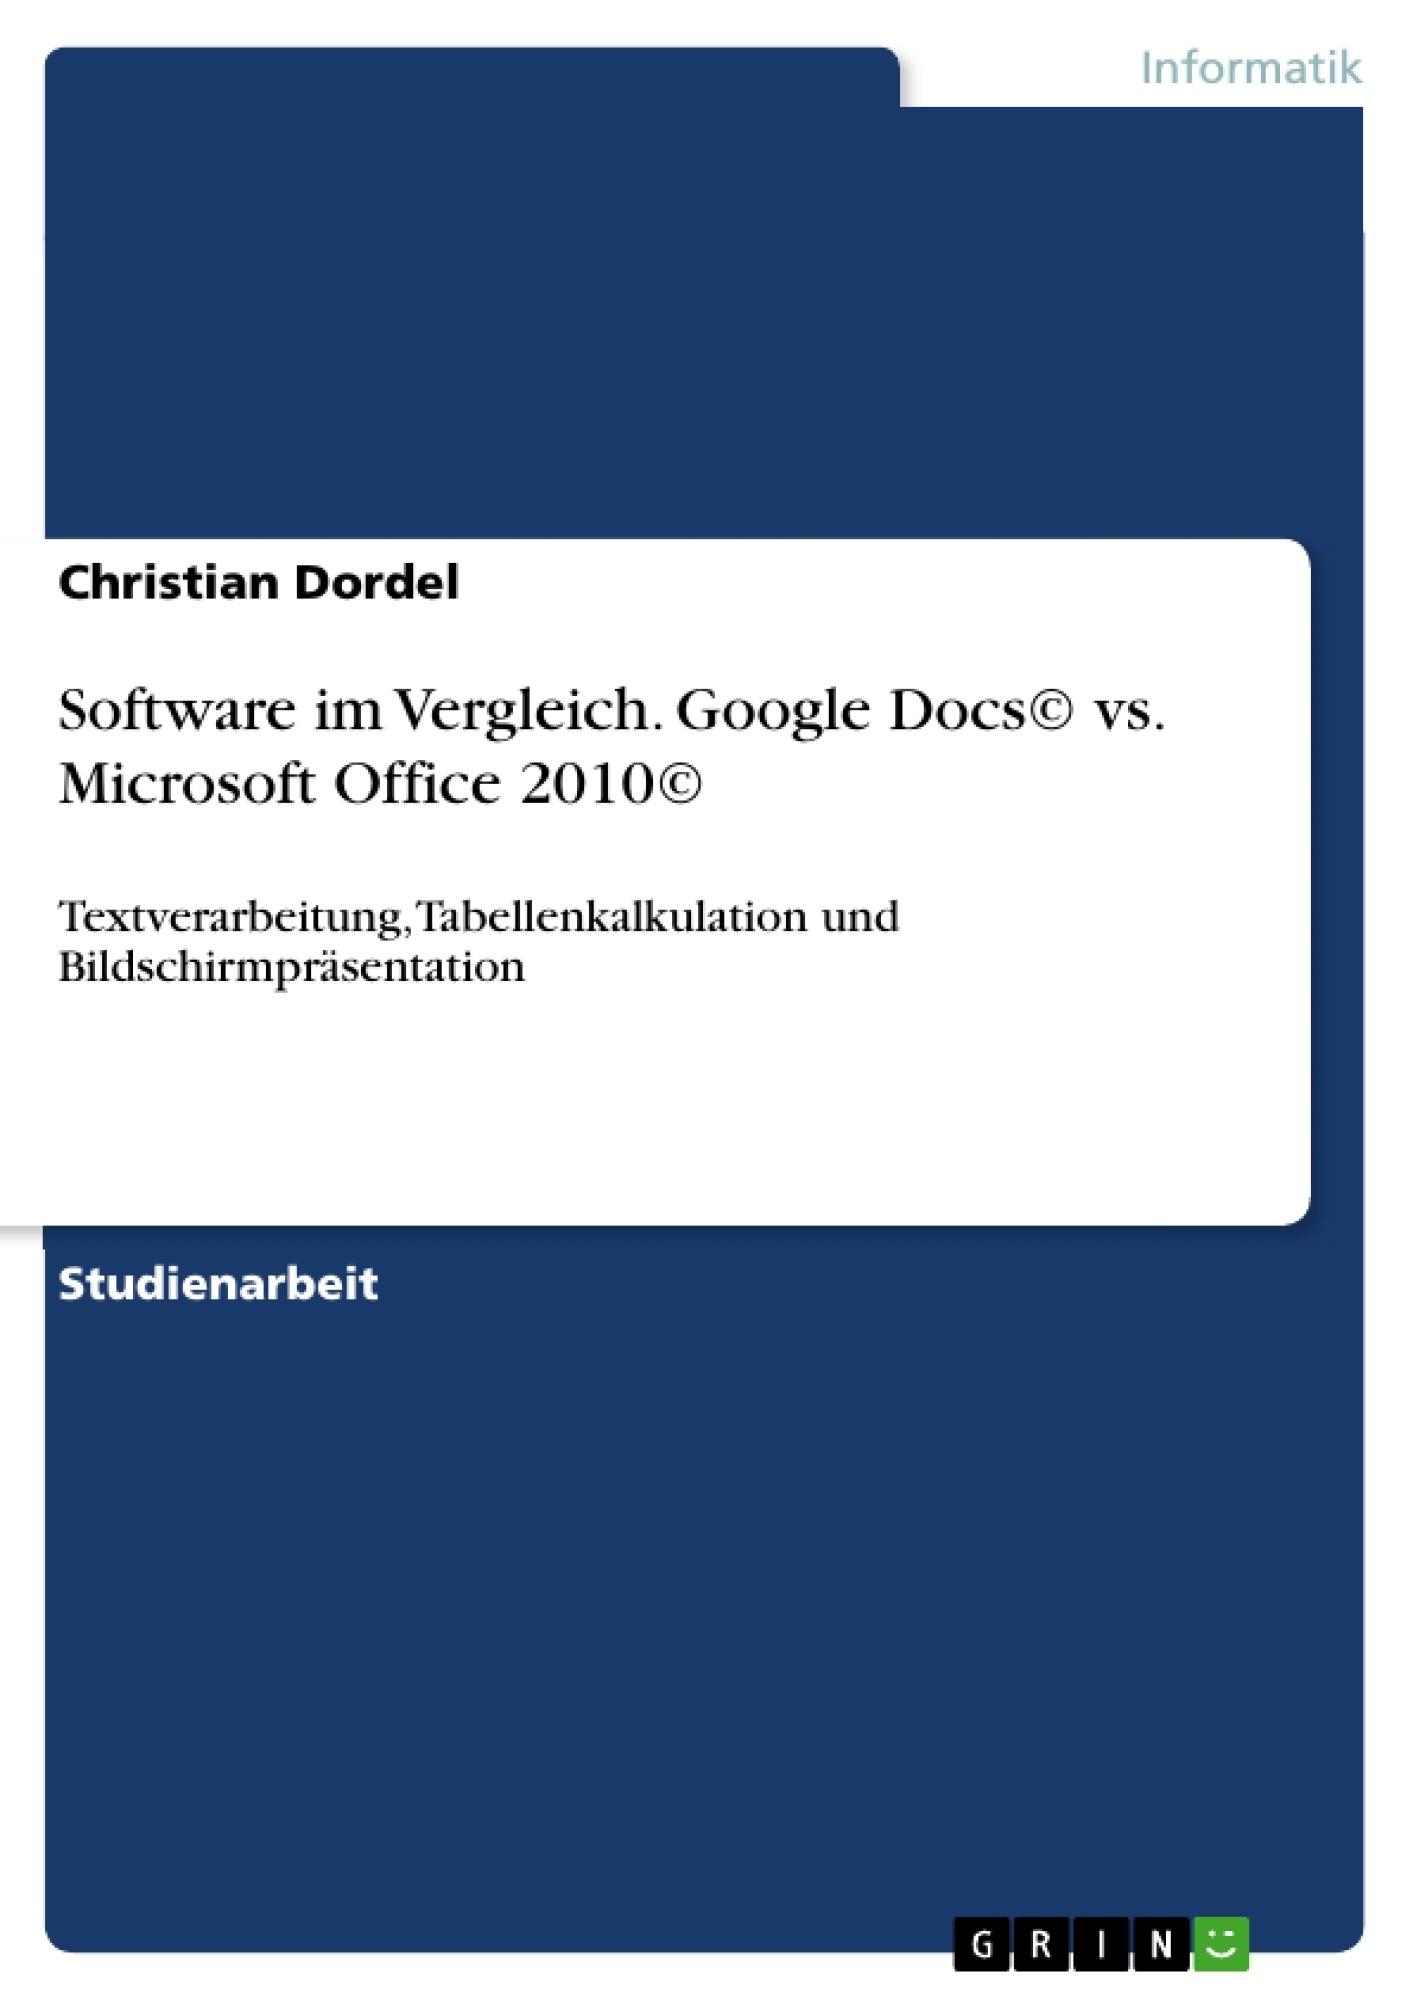 Software im Vergleich. Google Docs© vs. Microsoft Office 2010 ...